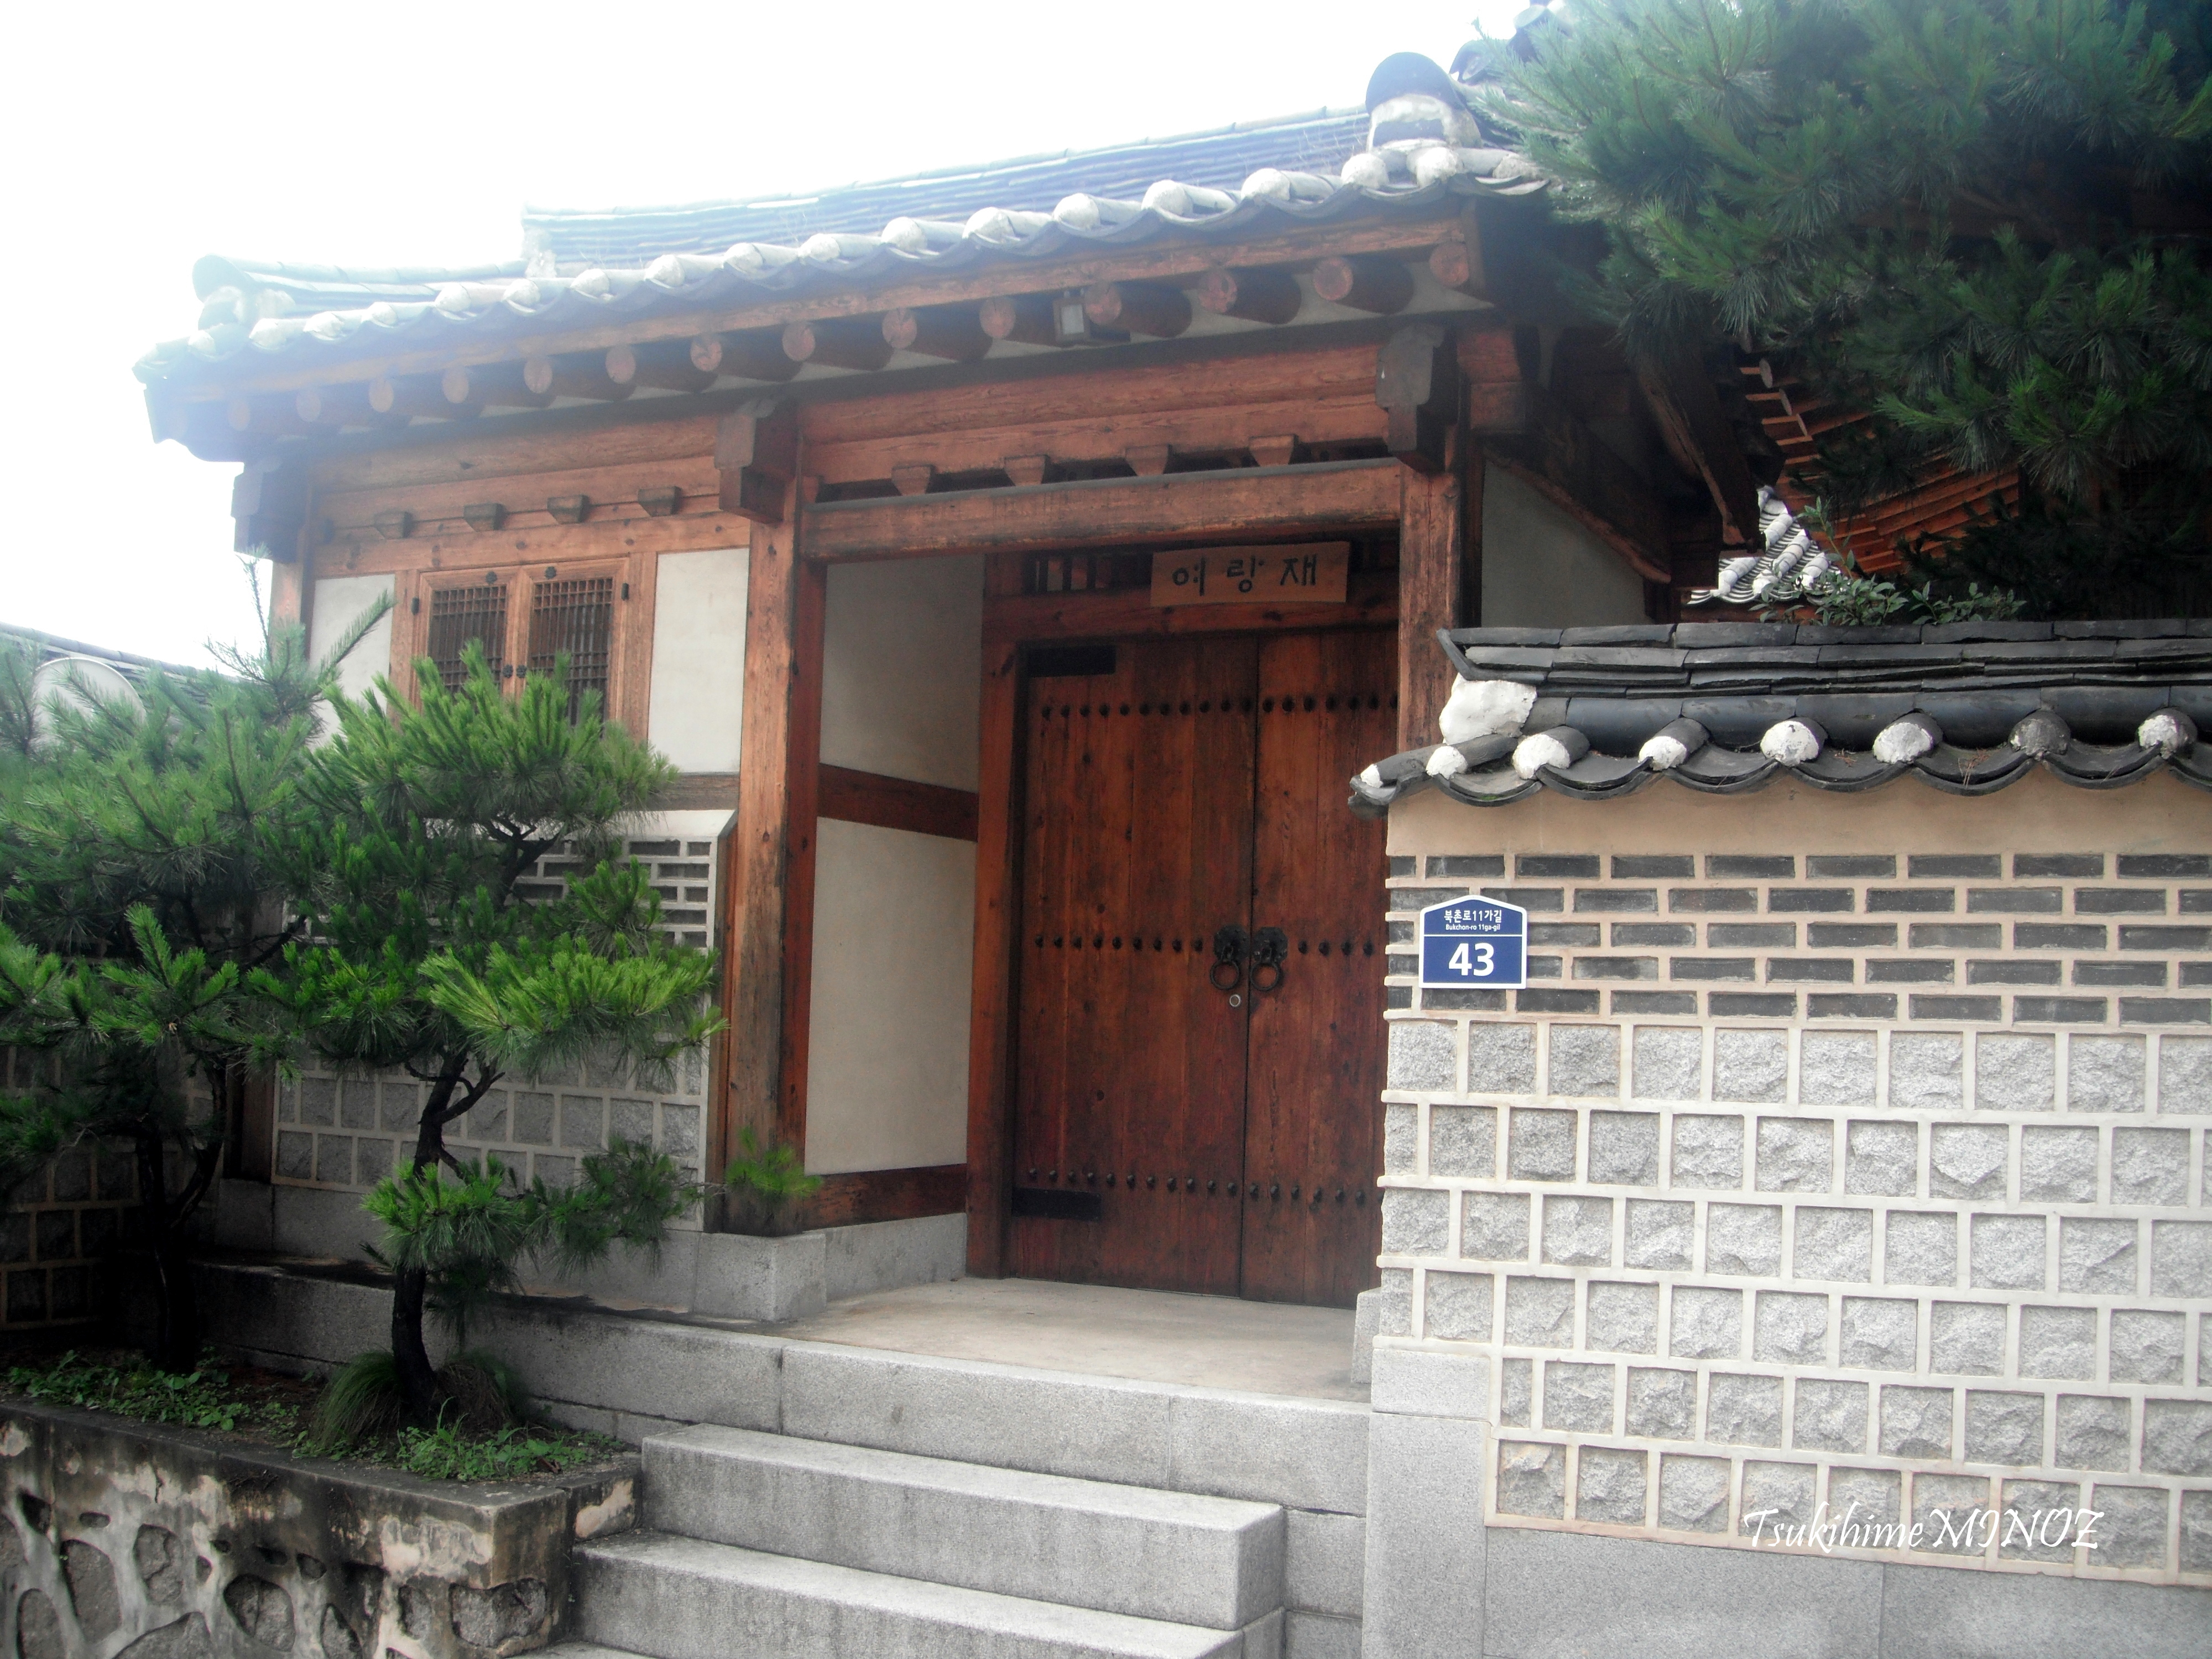 Viaje a corea 25 de julio de 2011 addicted to lee min ho for Canal pasiones jardin secreto capitulos